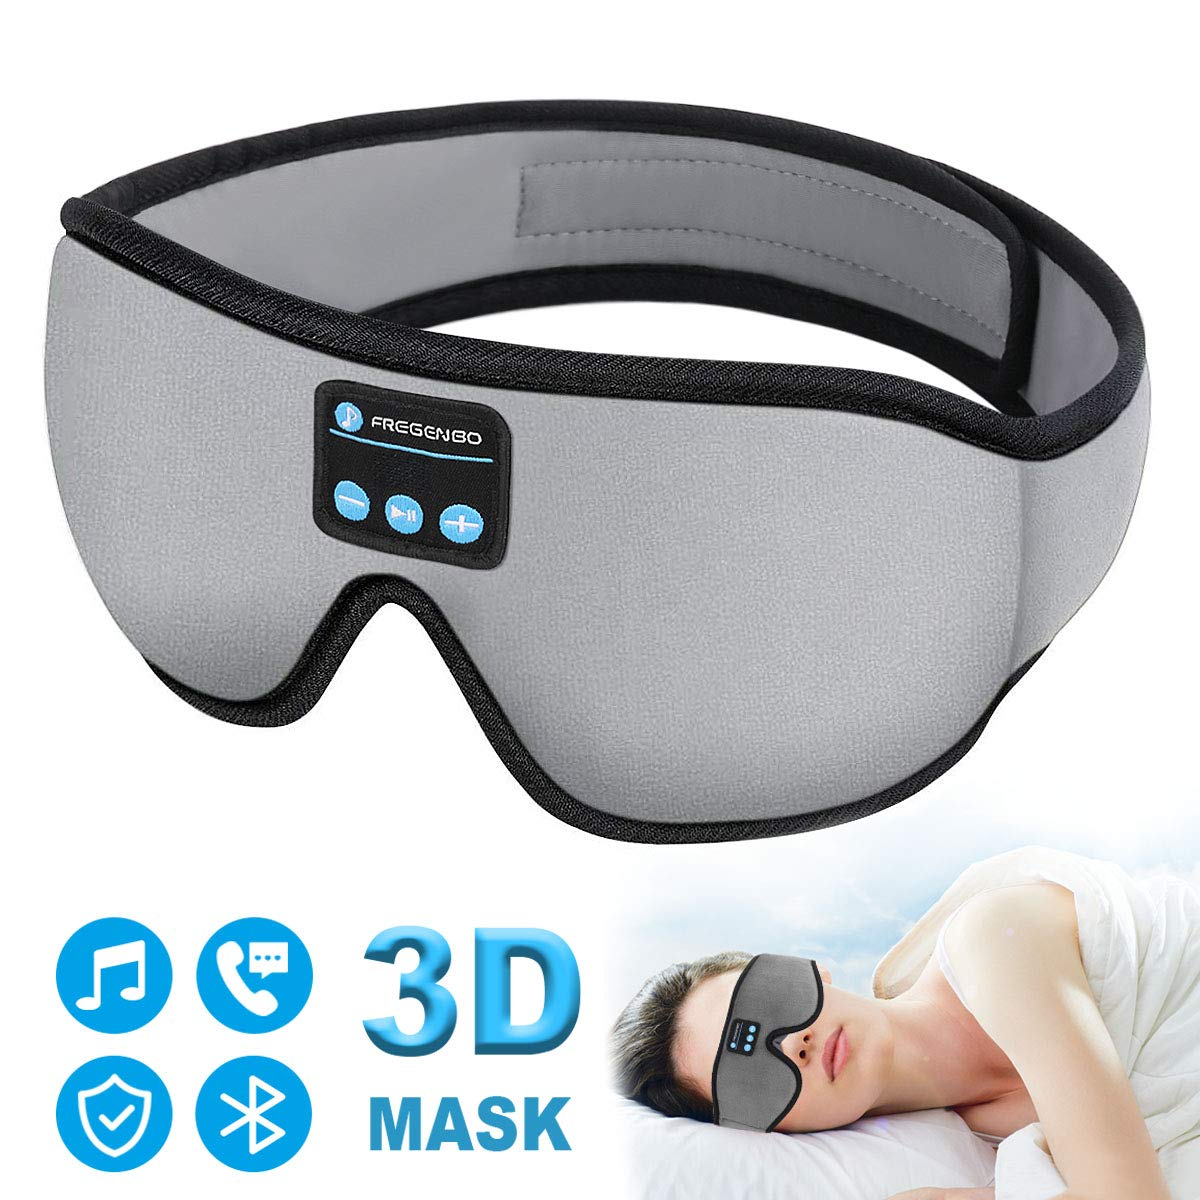 Sleep Headphones Bluetooth Eye Mask, 20-28 inches Adjustable FREGENBO Music 3D Sleep Mask 2020 Upgraded, Wireless Sleeping Headphones for Side Sleepers, HandsFree for Meditation Insomnia Airplane